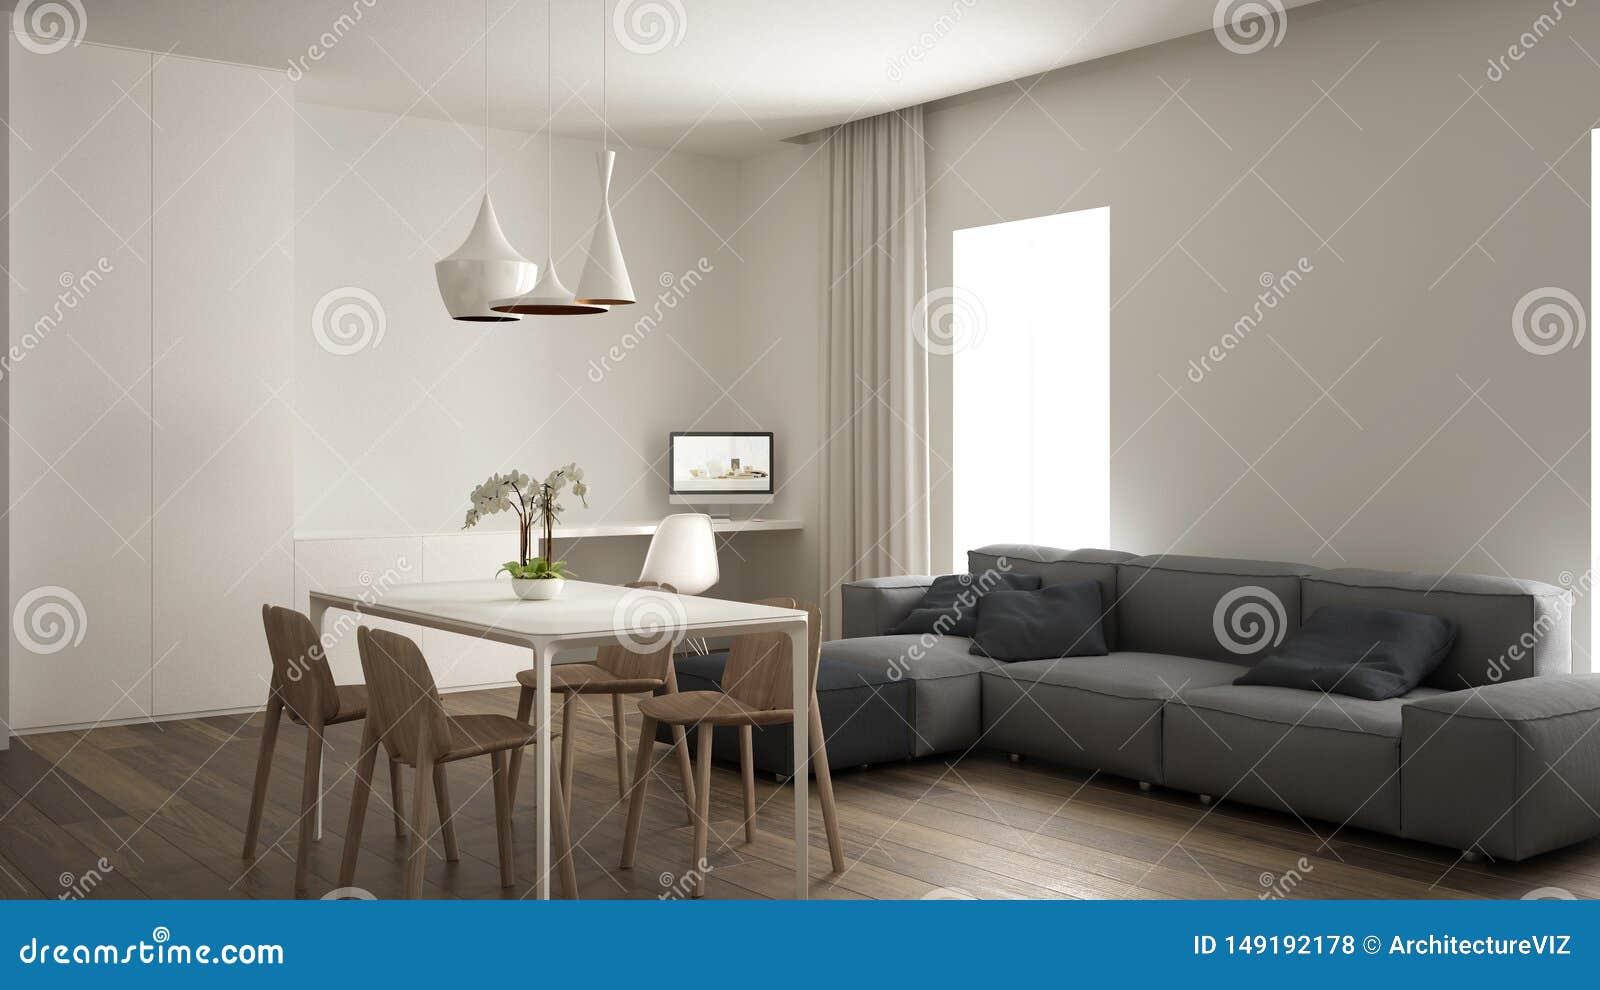 Minimalist Living Room Interior Design Home Working Space